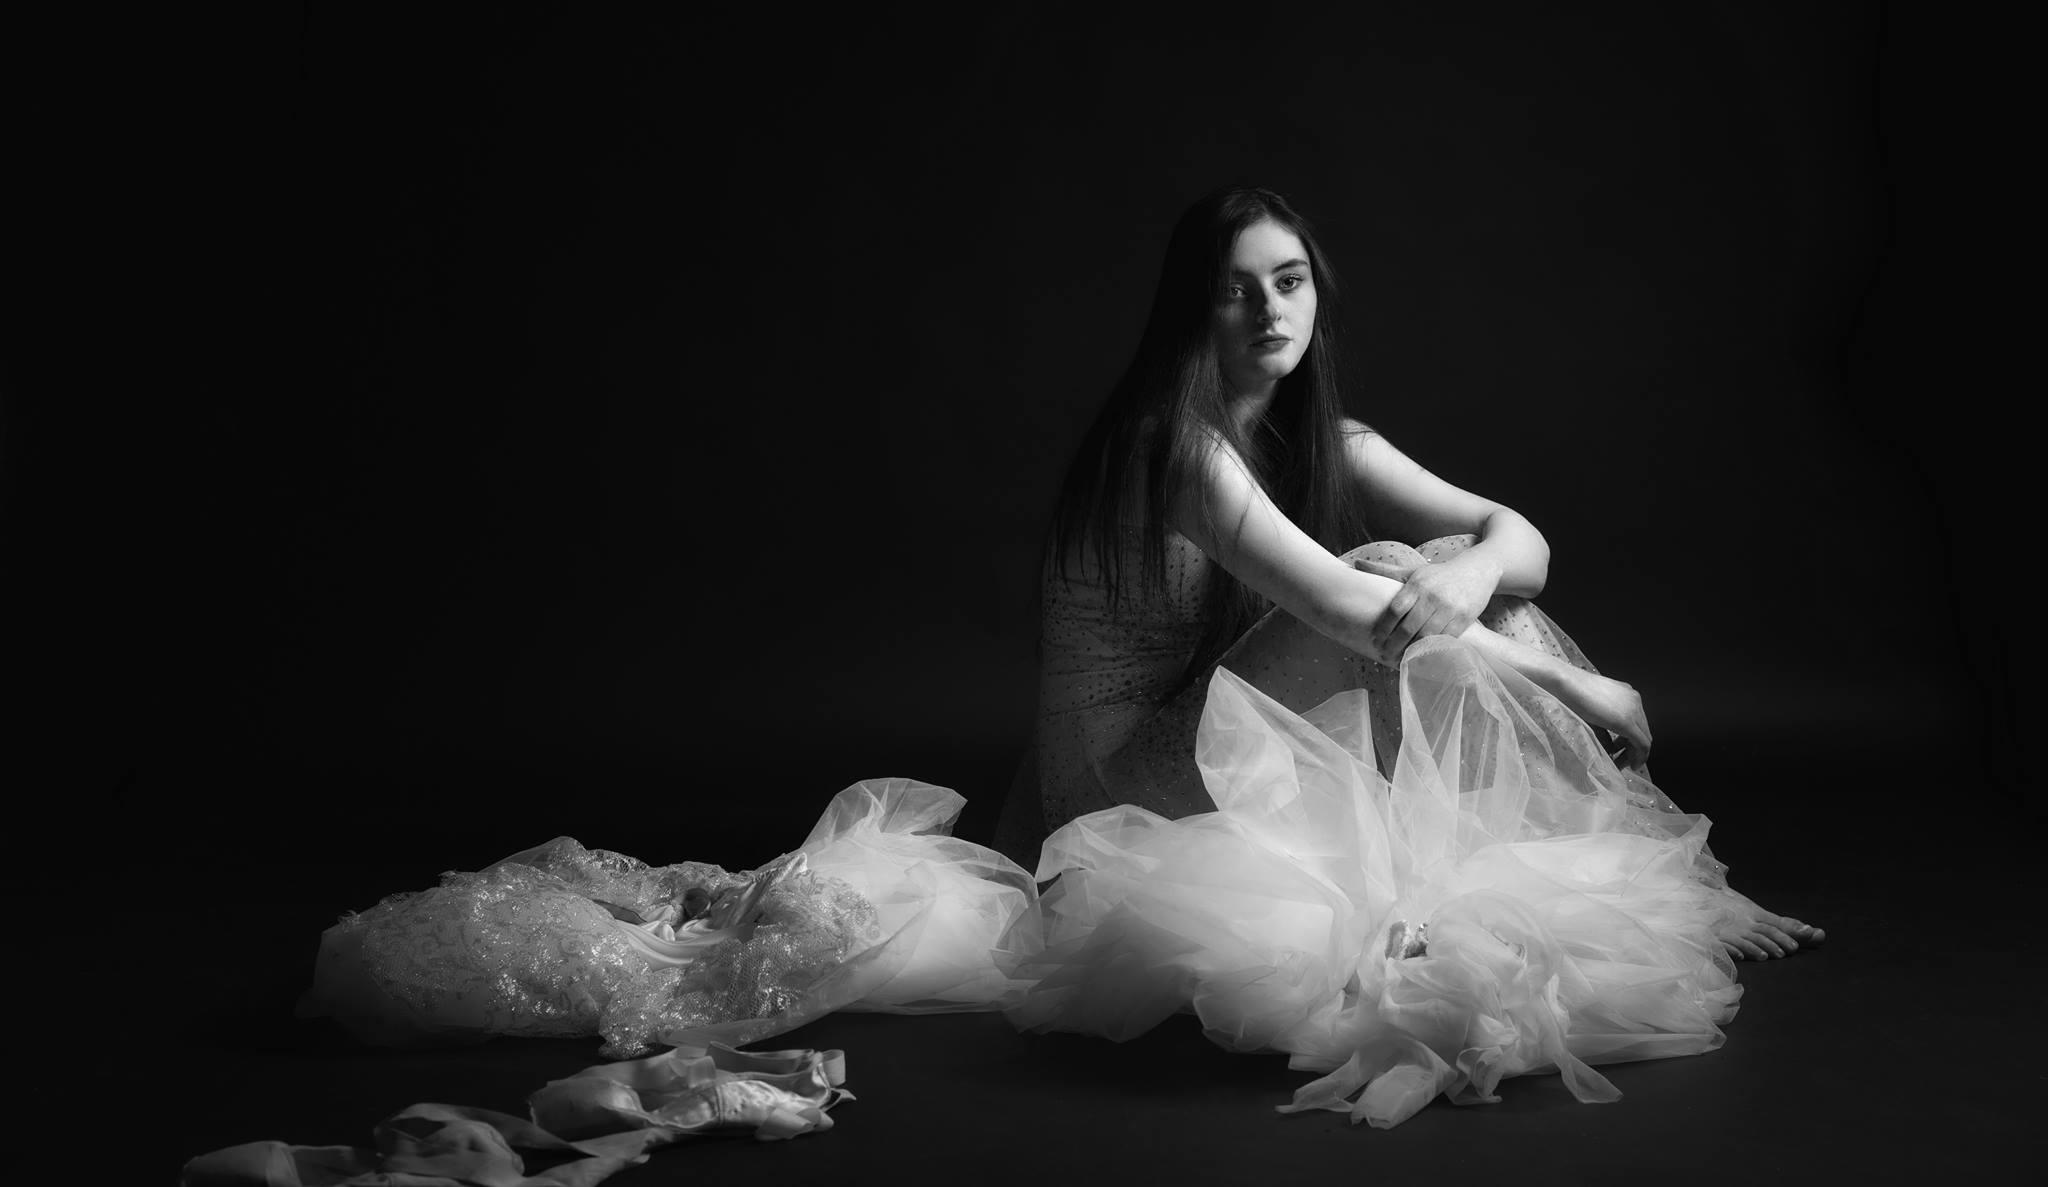 Tom_Lupton_Portrait_Photography_Alaina.jpg